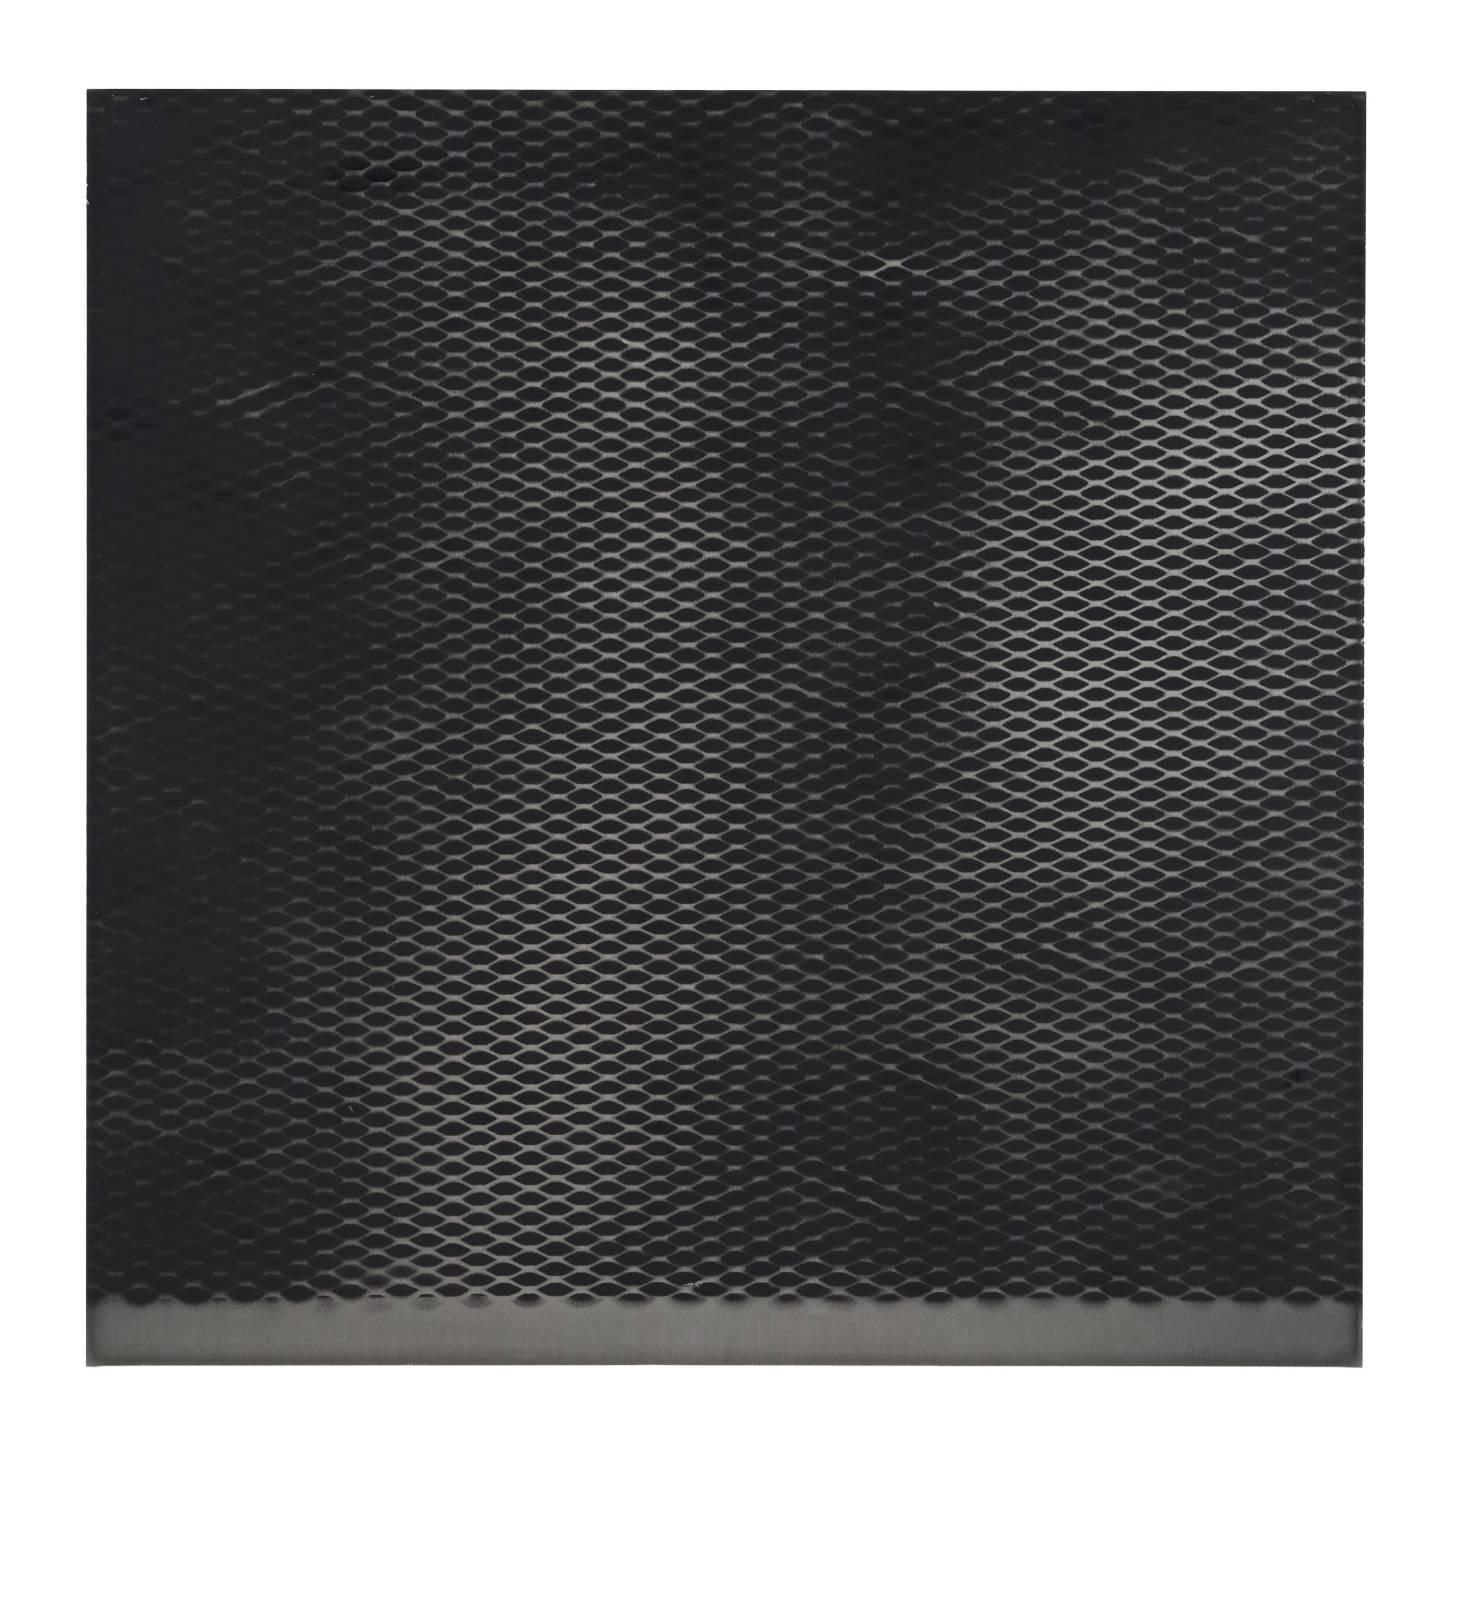 "STAIN : 40°42'46.5""N 73°56'06.1""W, 2015, spraypaint on aluminium, 81,3 x 81,3 cm"